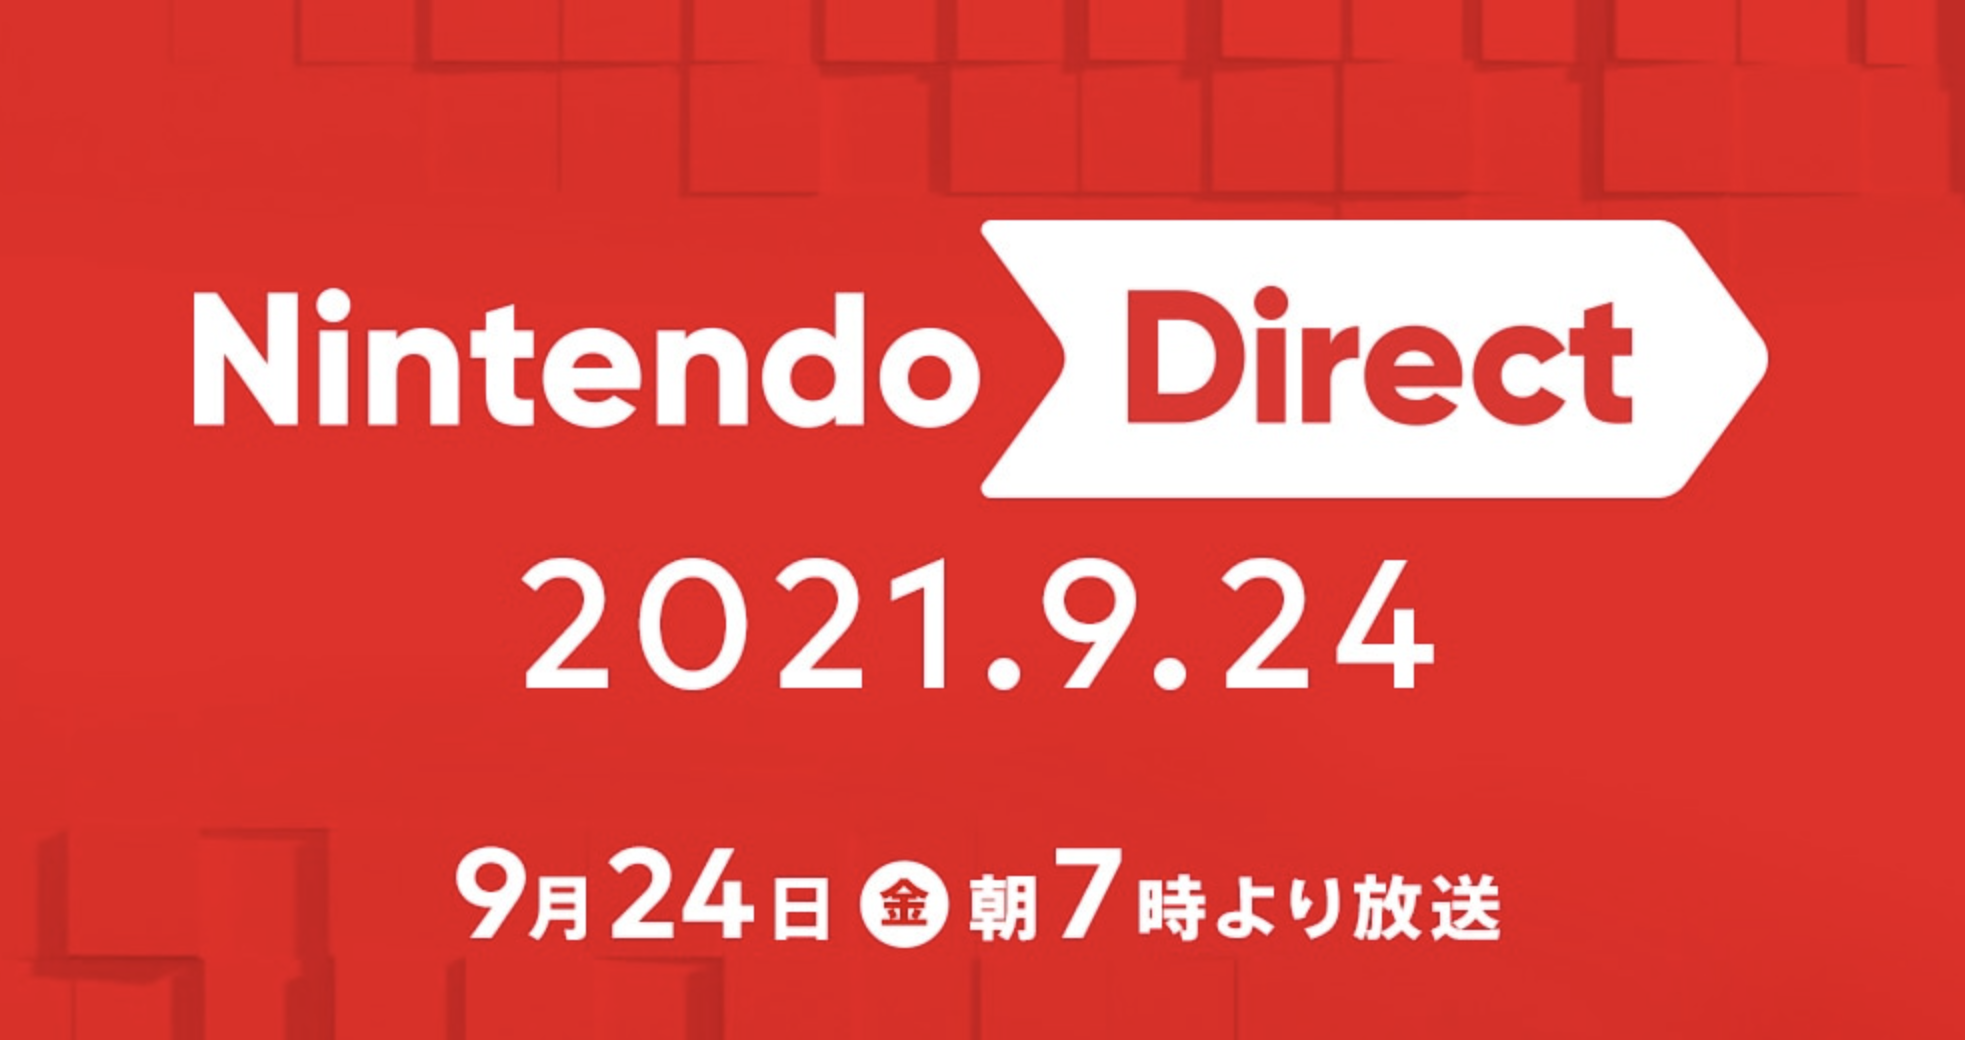 Nintendo Direct Hitting Friday, September 24 in Japan